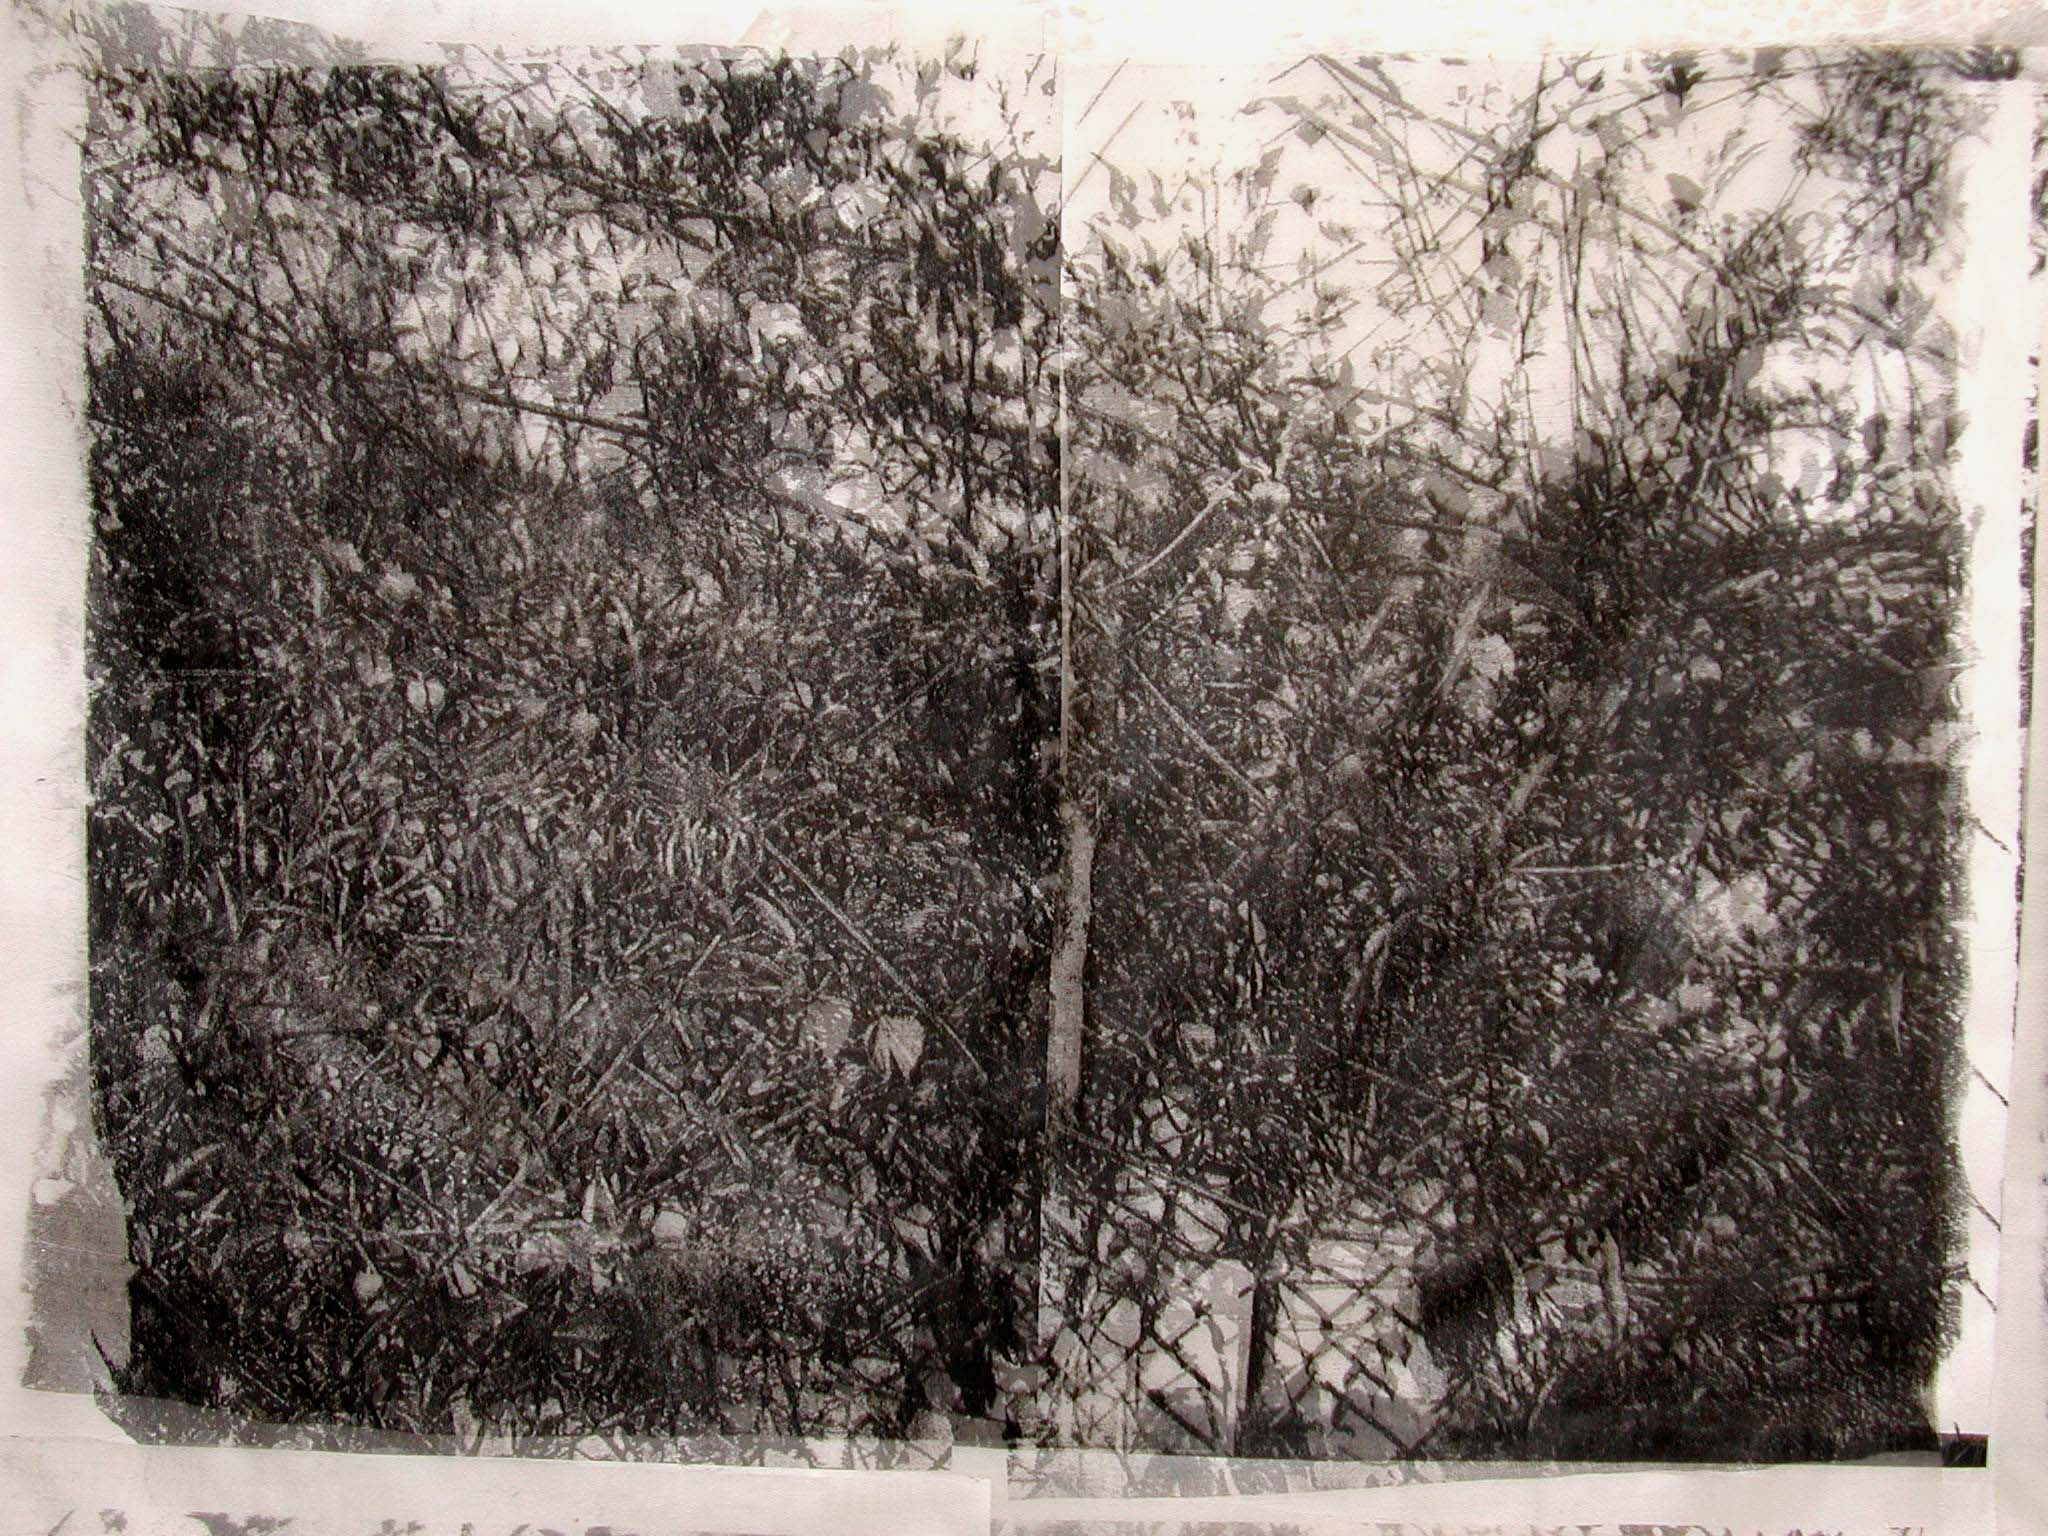 rohini-devasher-copyright-thicket-variation-2004